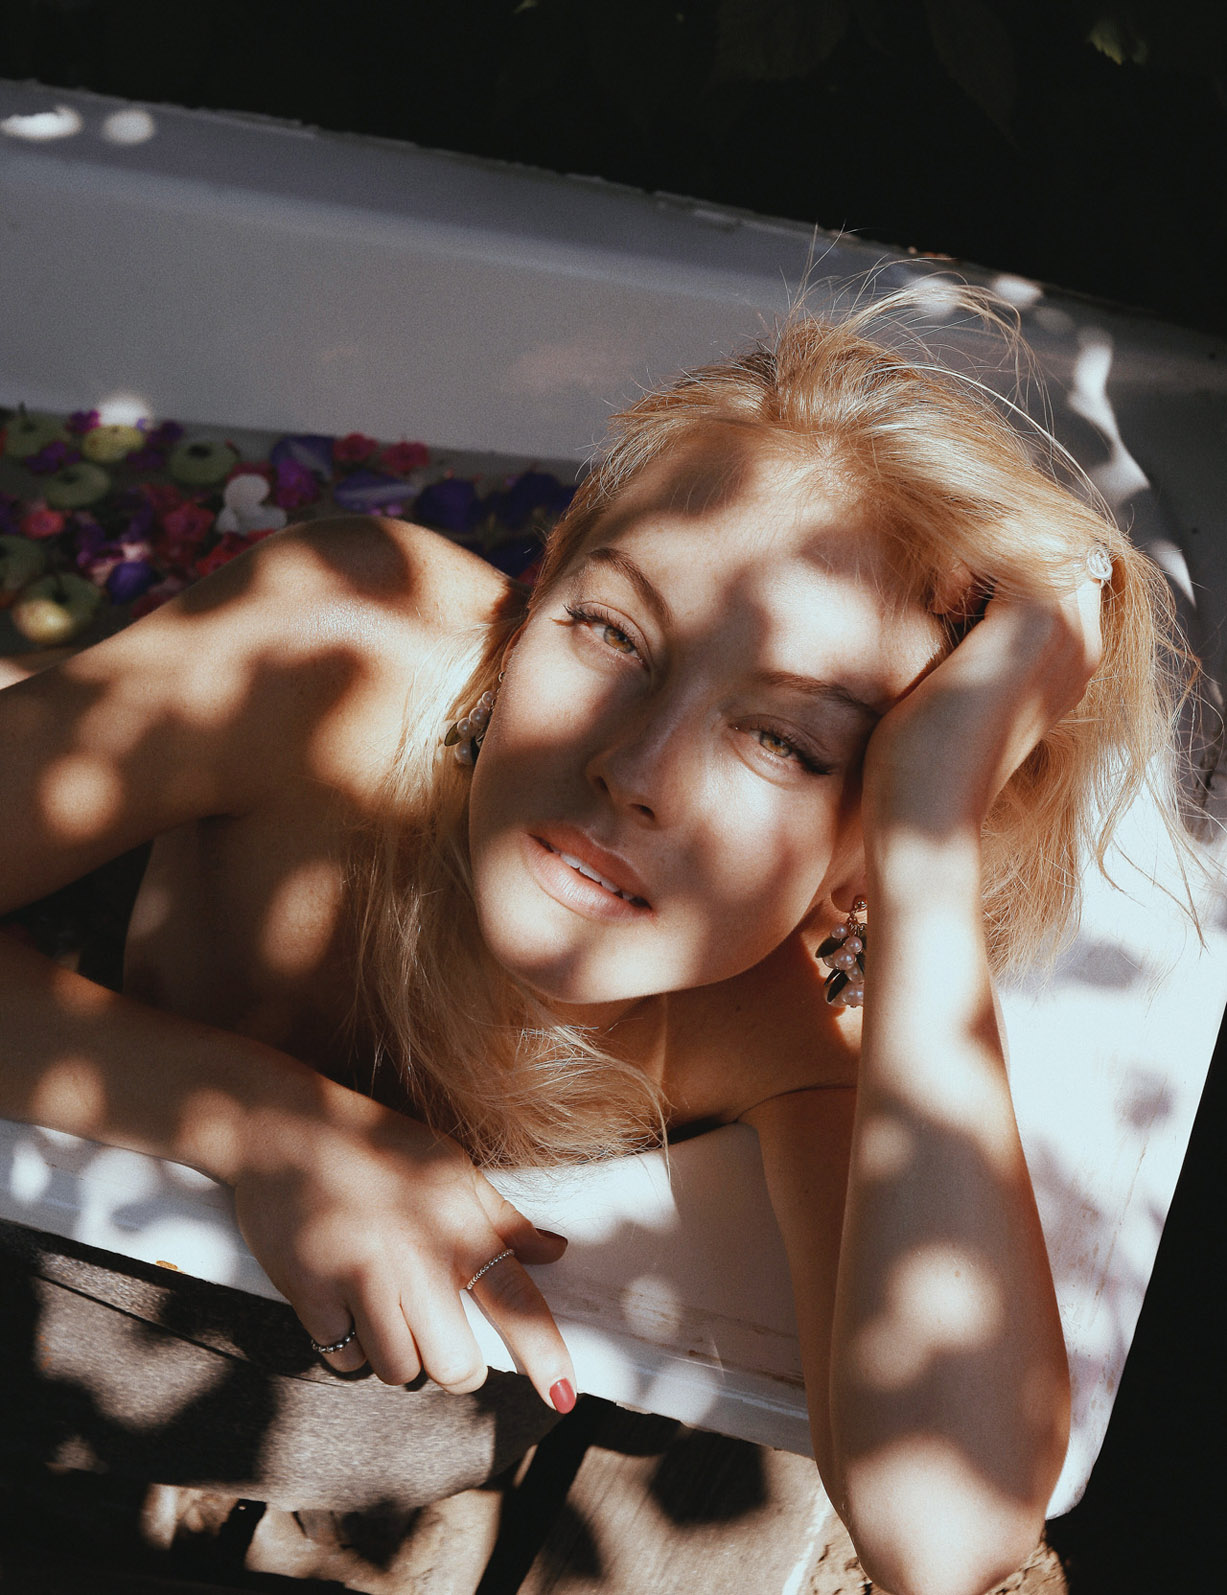 Katya Kudinskaya nude by Alina Gaf